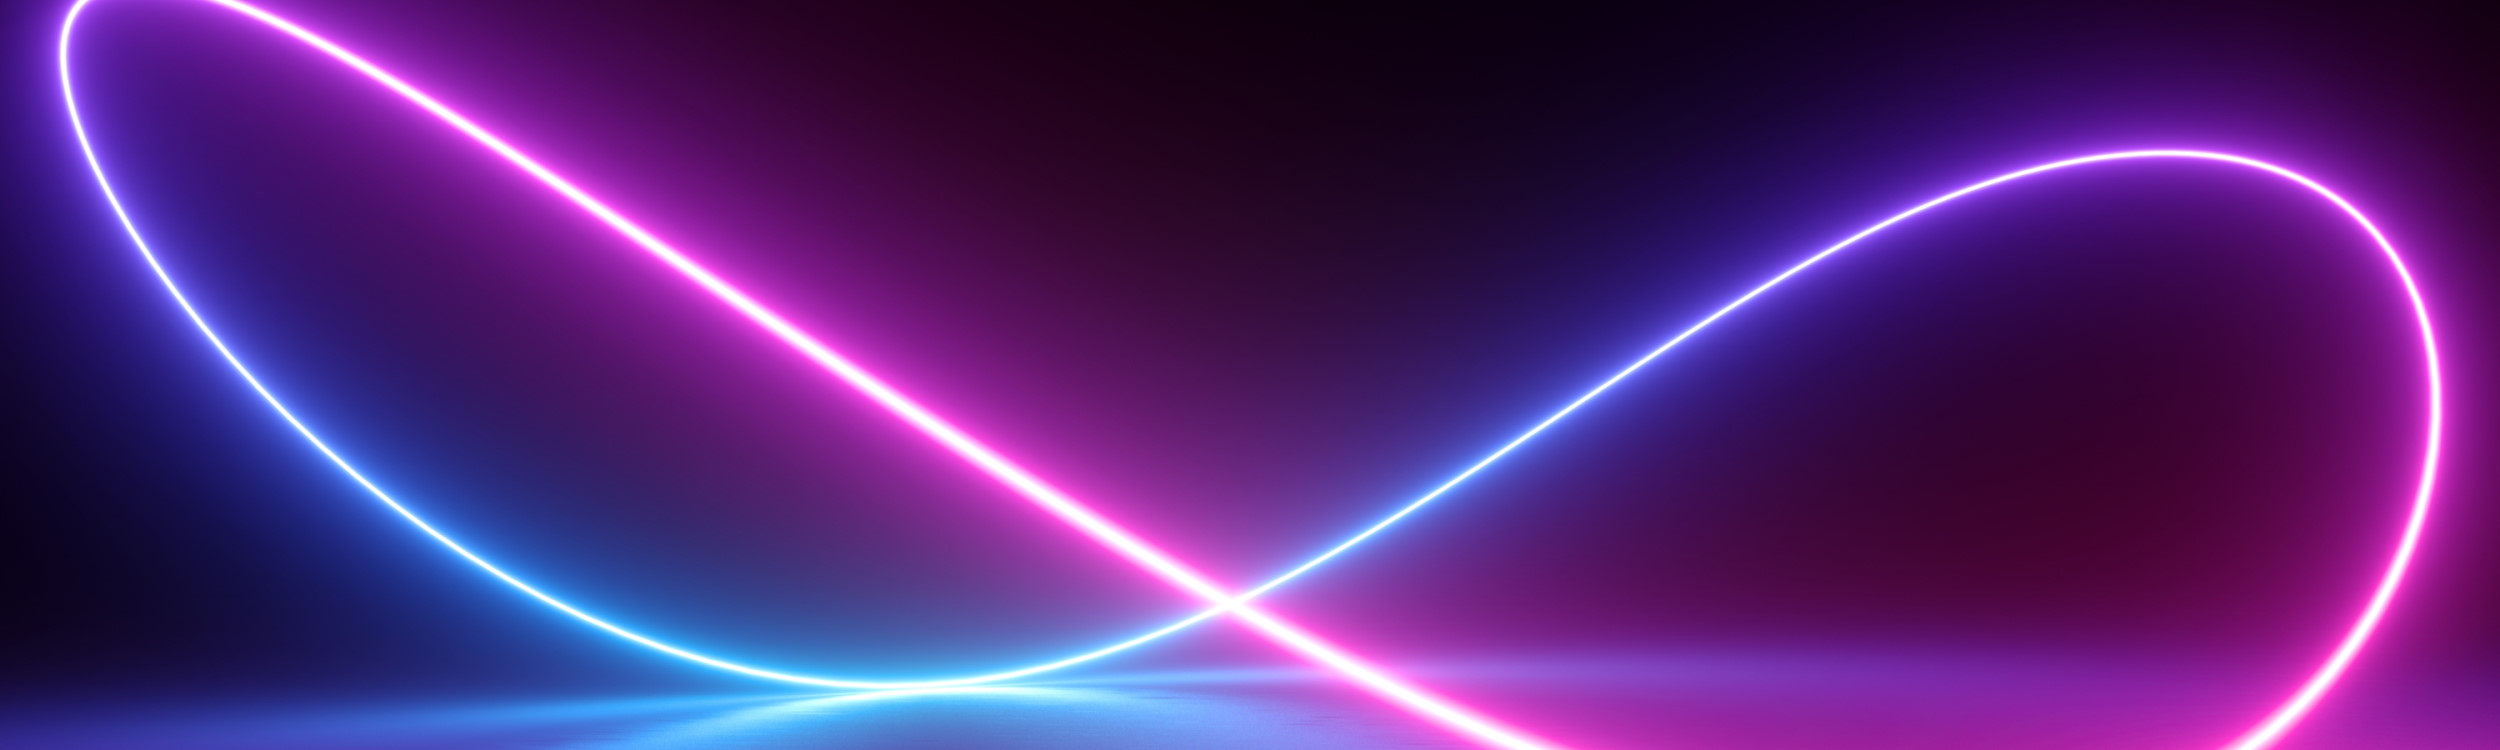 neon-nagel_header_weihnachtsbeleuchtung